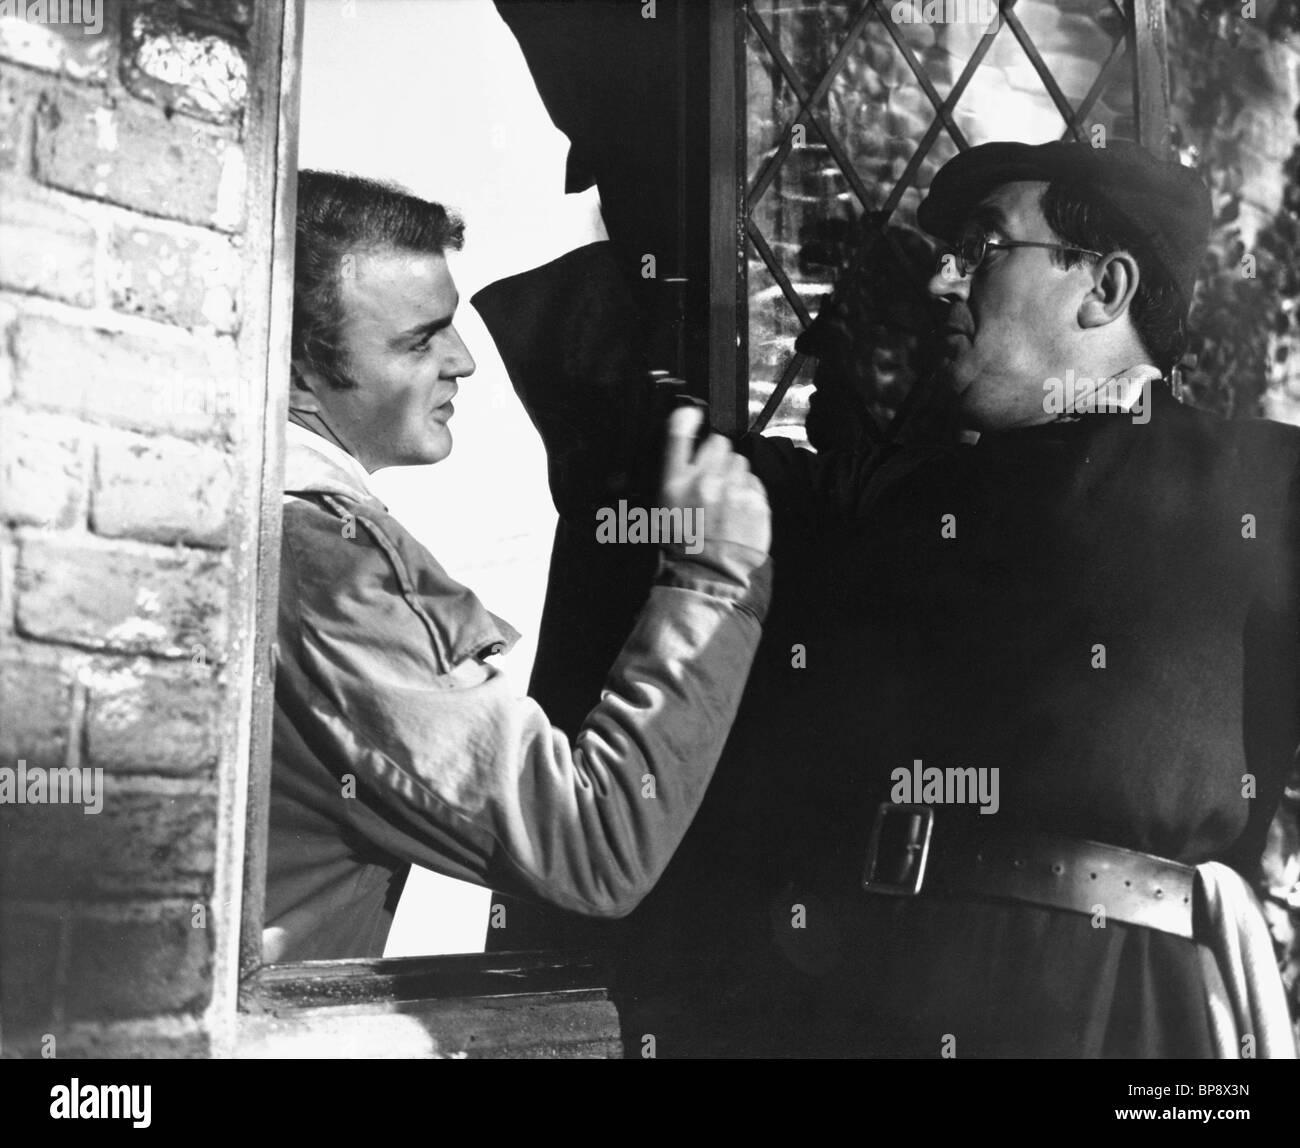 SCOTT FREDERICKS, EDWARD SINCLAIR, DAD'S ARMY, 1971 - Stock Image